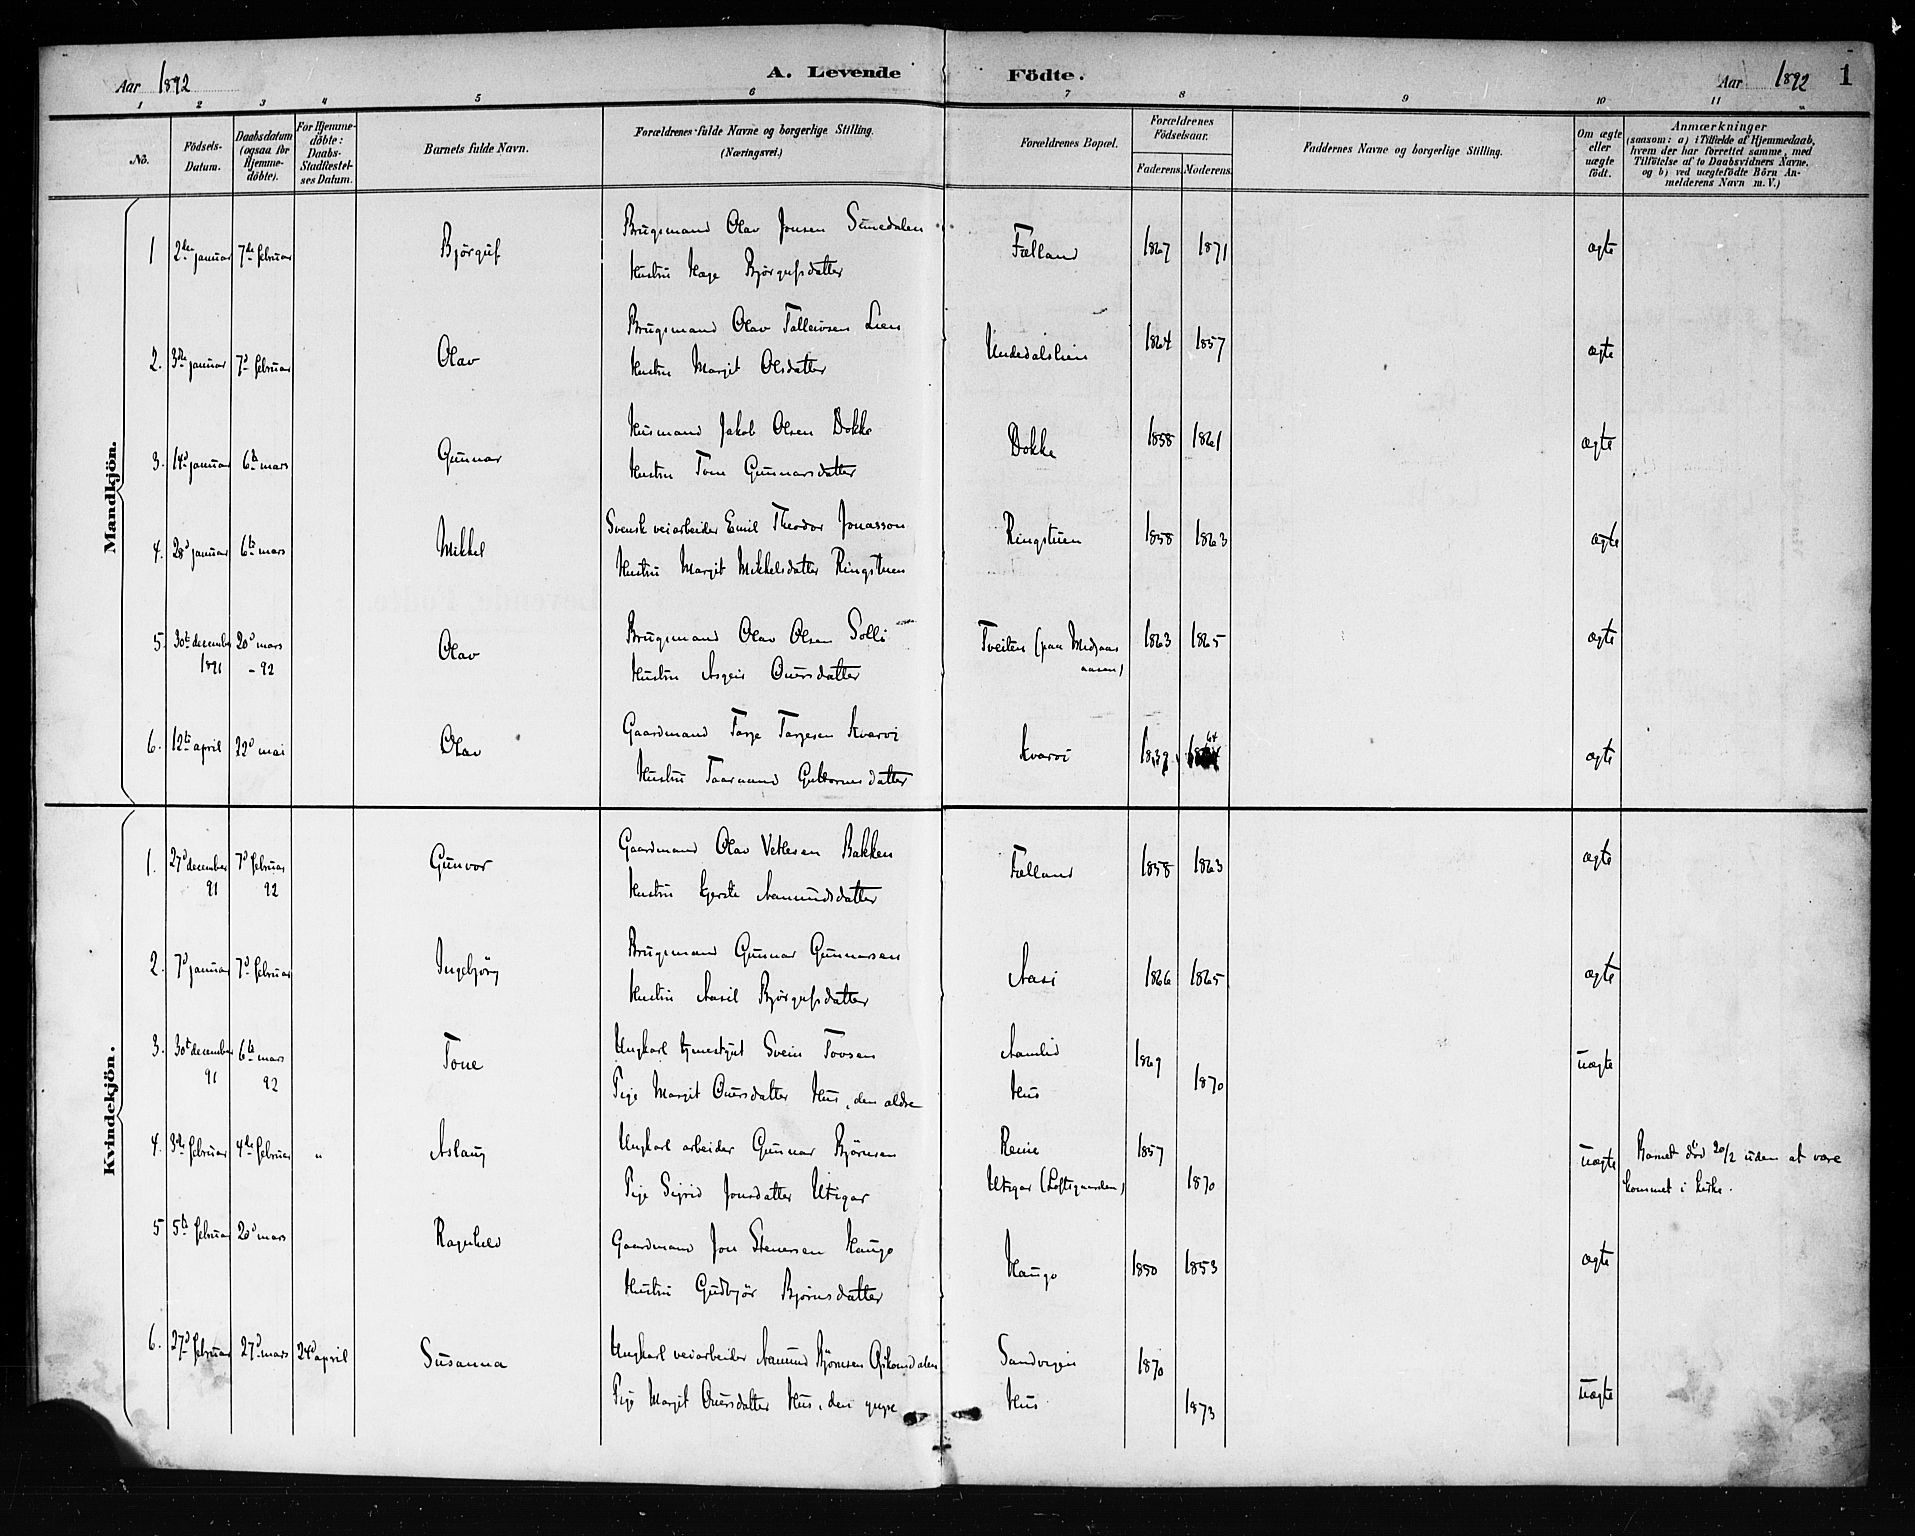 SAKO, Mo kirkebøker, G/Ga/L0002: Klokkerbok nr. I 2, 1892-1914, s. 1